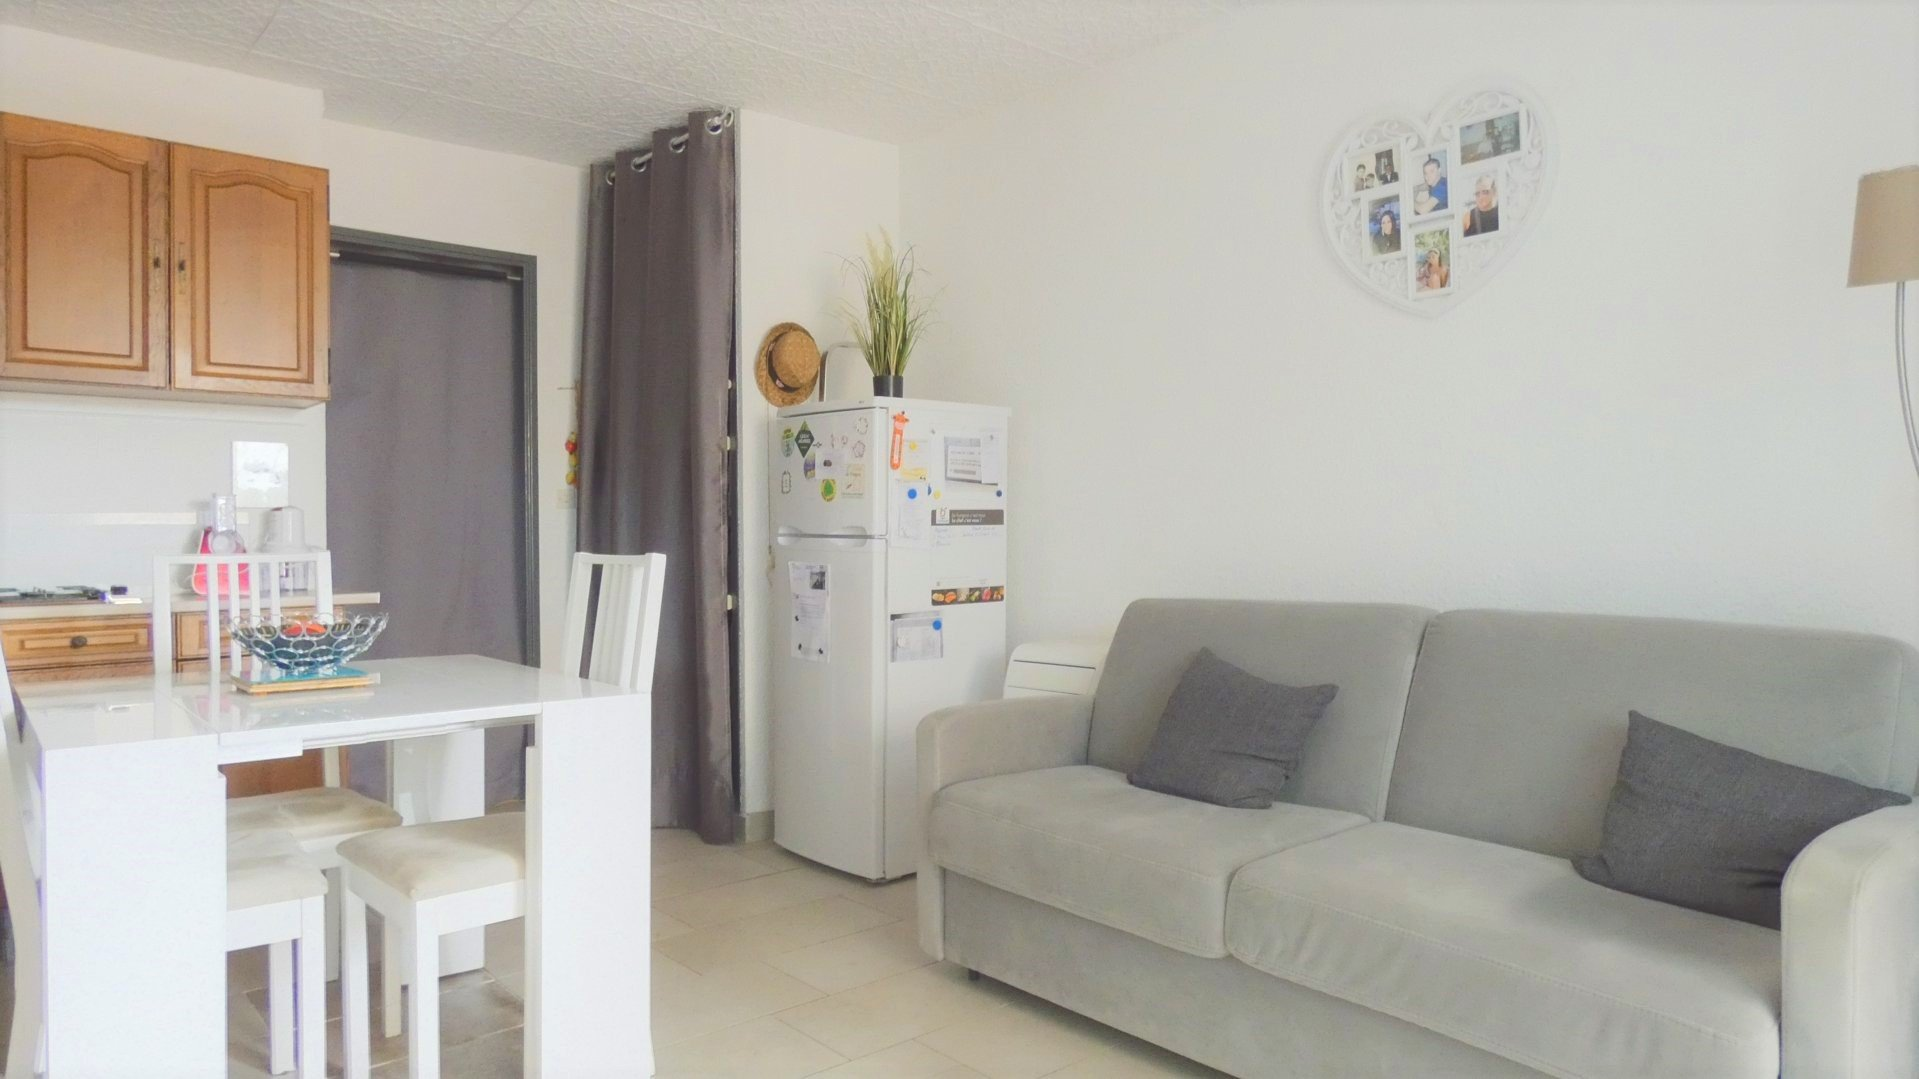 EXCLUSIVITE - STUDIO - 30 m² - LA COURONNE